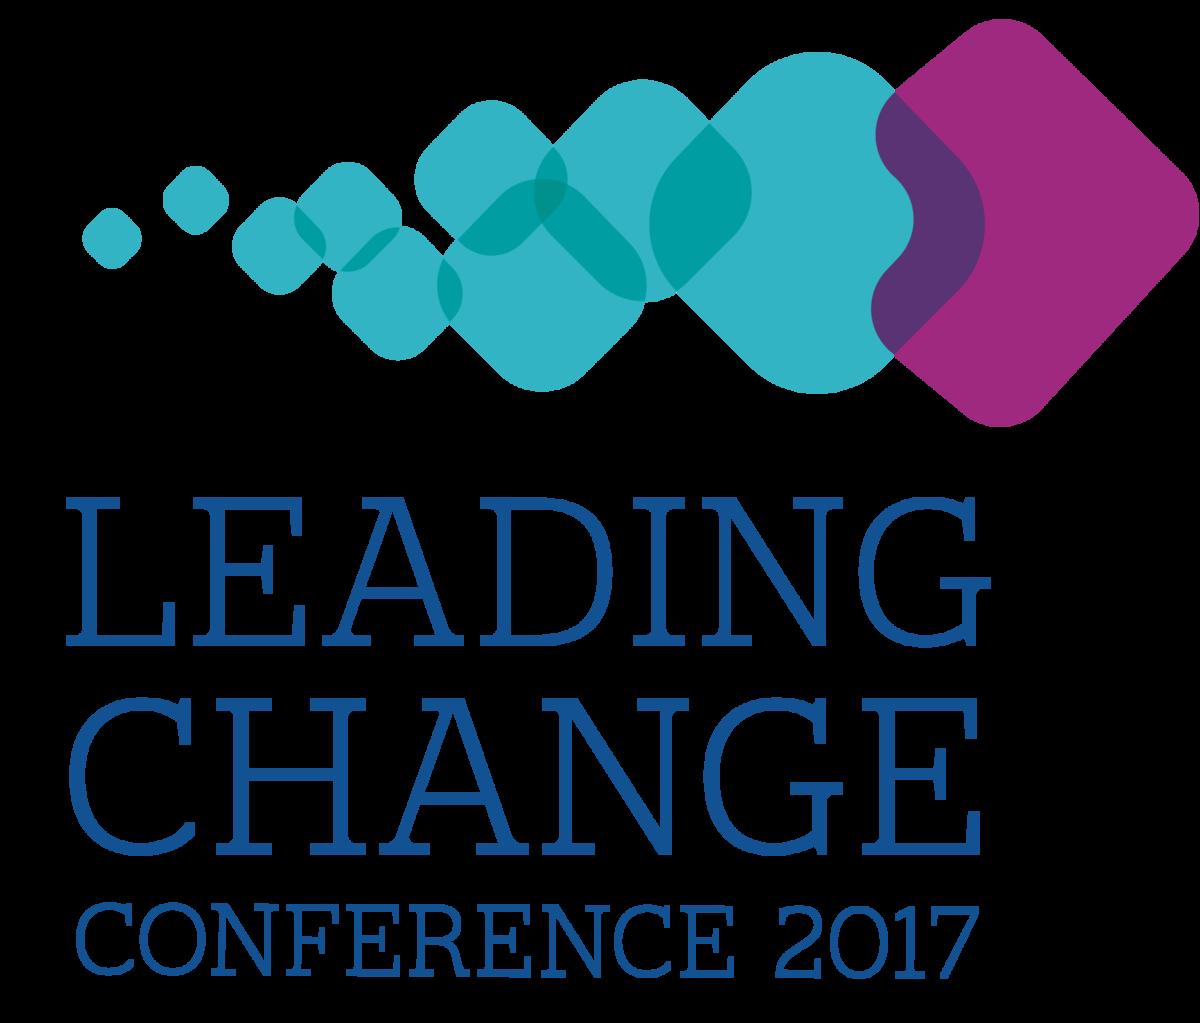 Leading Change Conference 2017 Logo